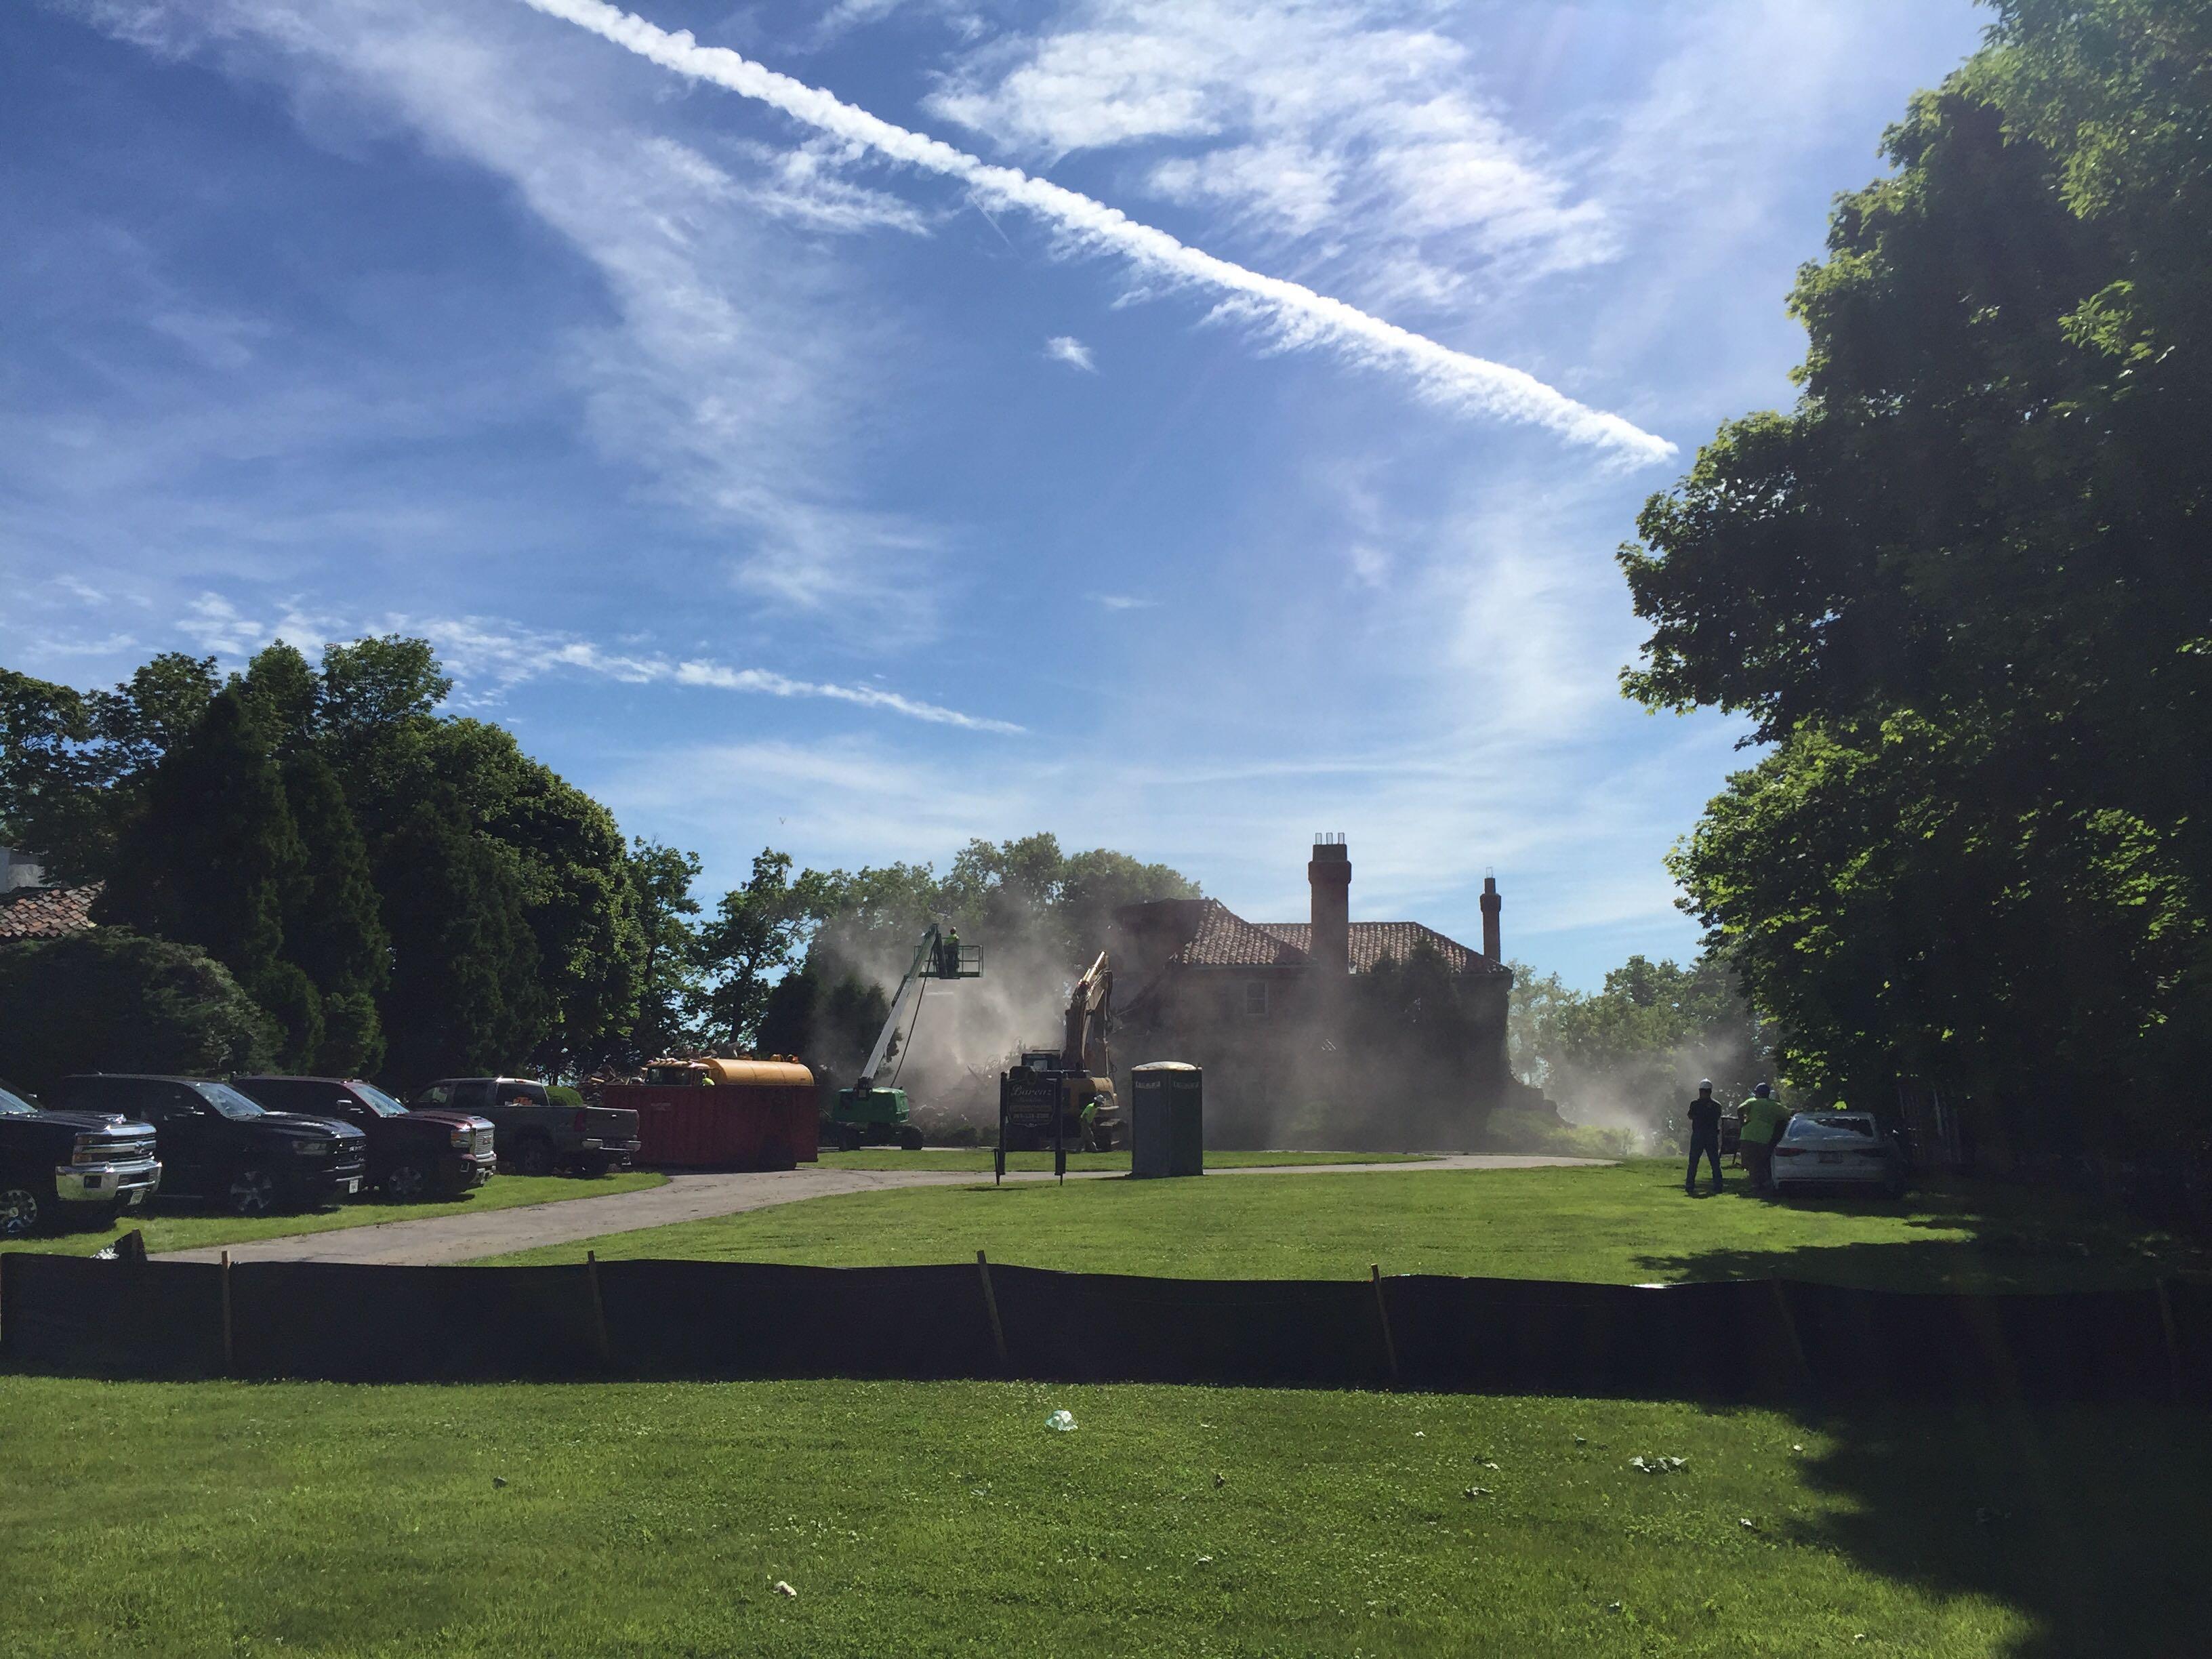 Demolition of Chris Abele's historic Eschweiler mansion. Photo by Dave Reid.